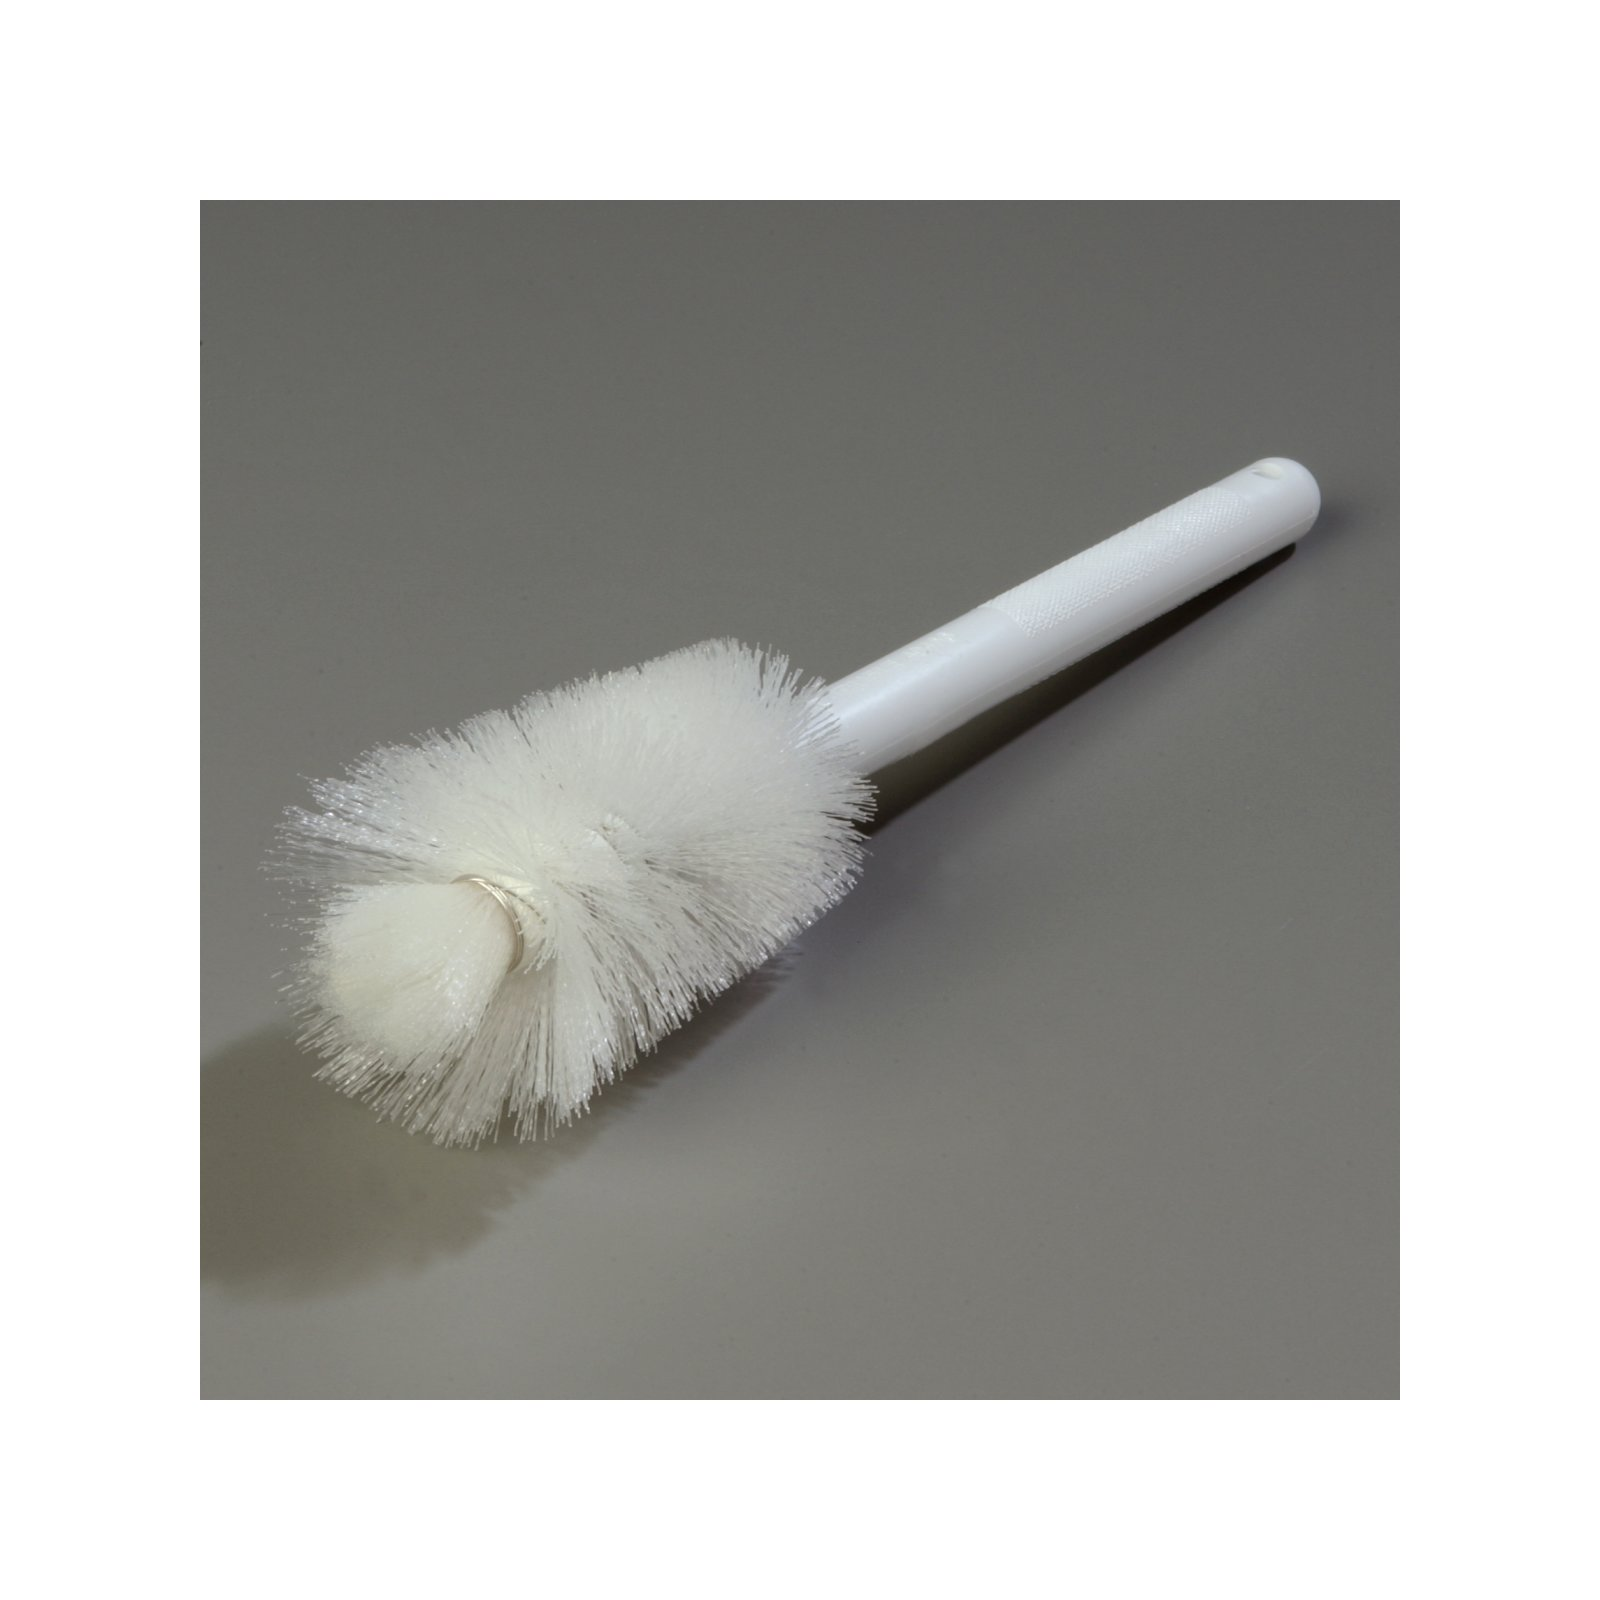 4046600 Sparta Handle Pint Bottle Brush W Polyester Bristles 12 Carlisle Foodservice Products